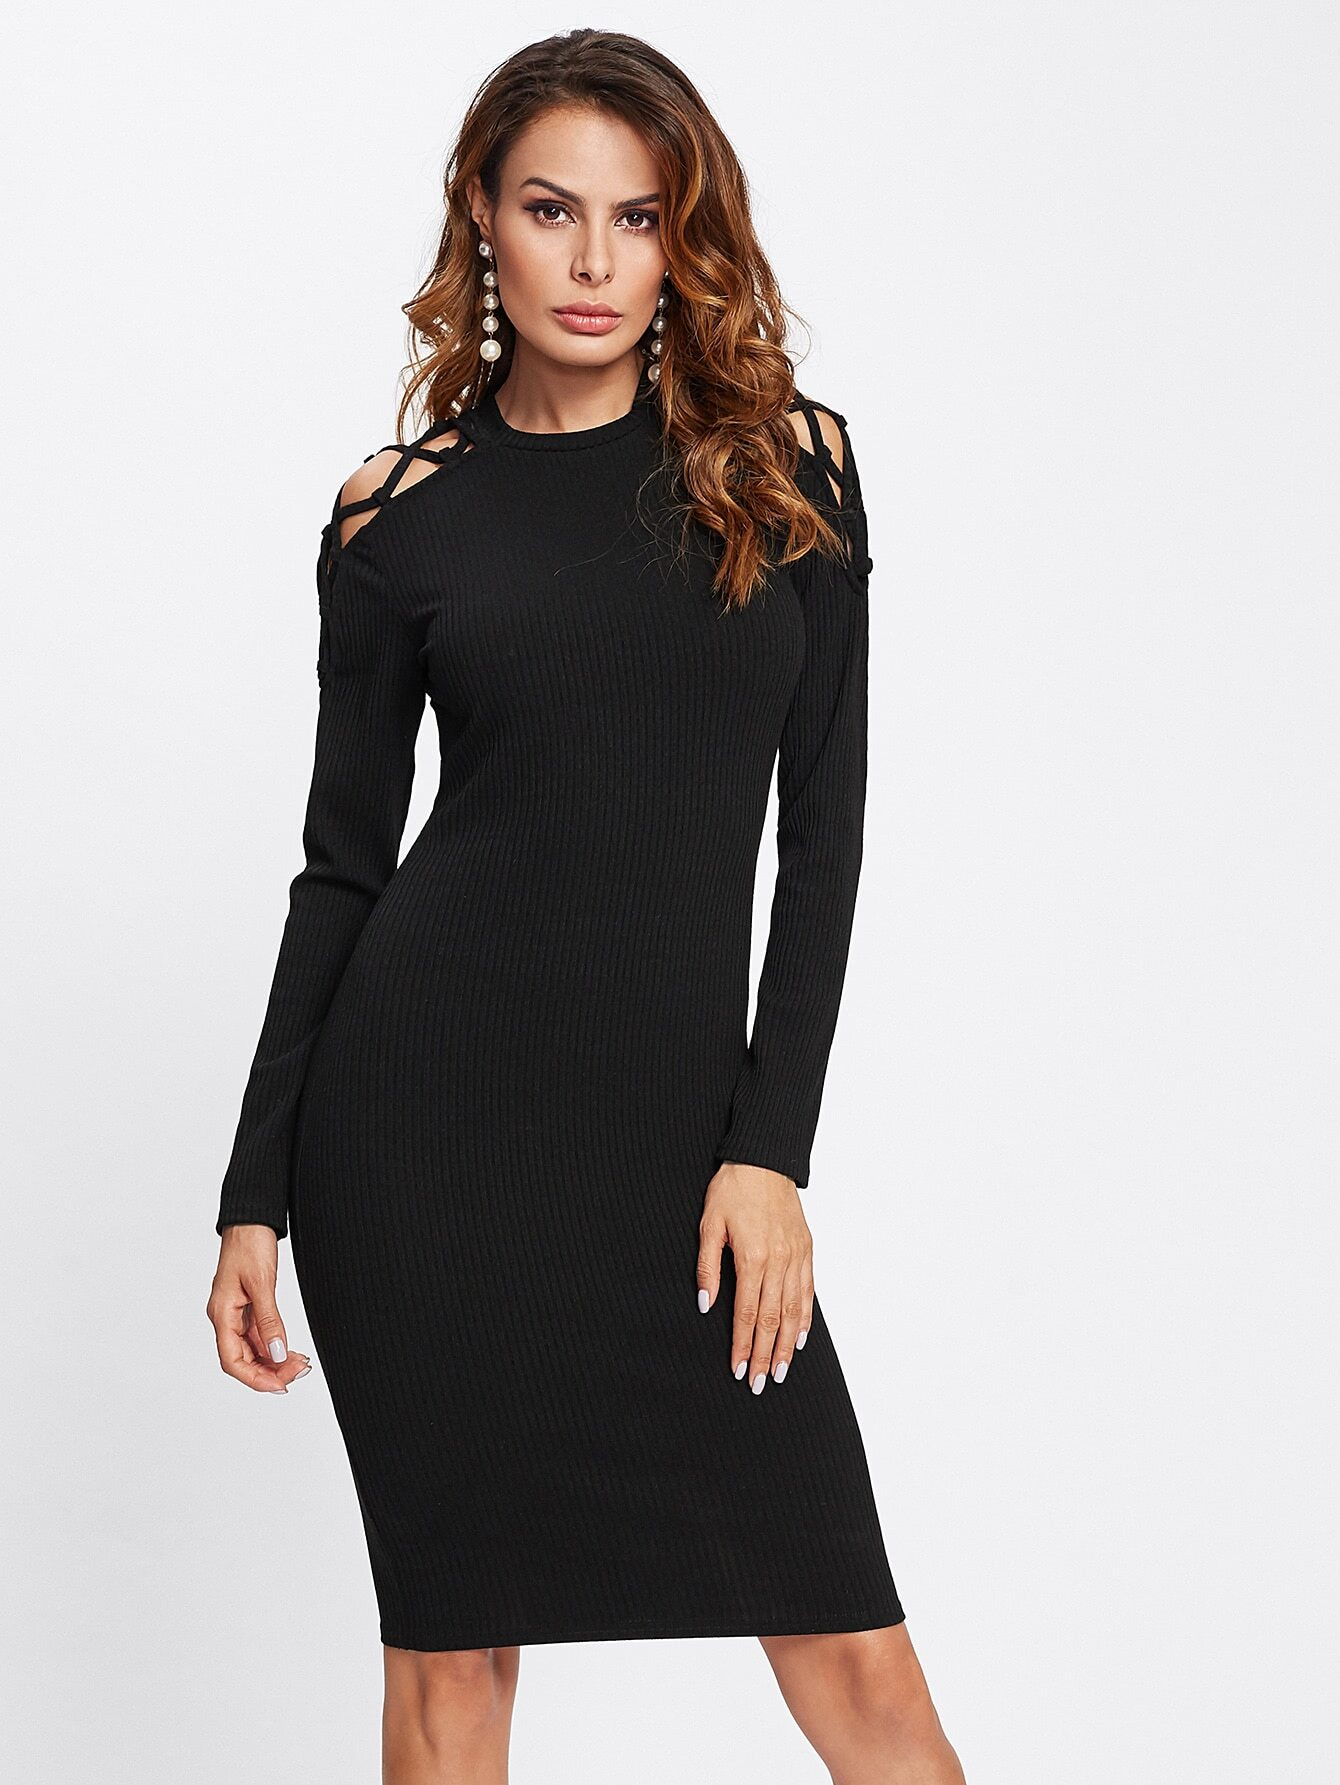 Cutout Crisscross Shoulder Rib Knit Dress dress171102712